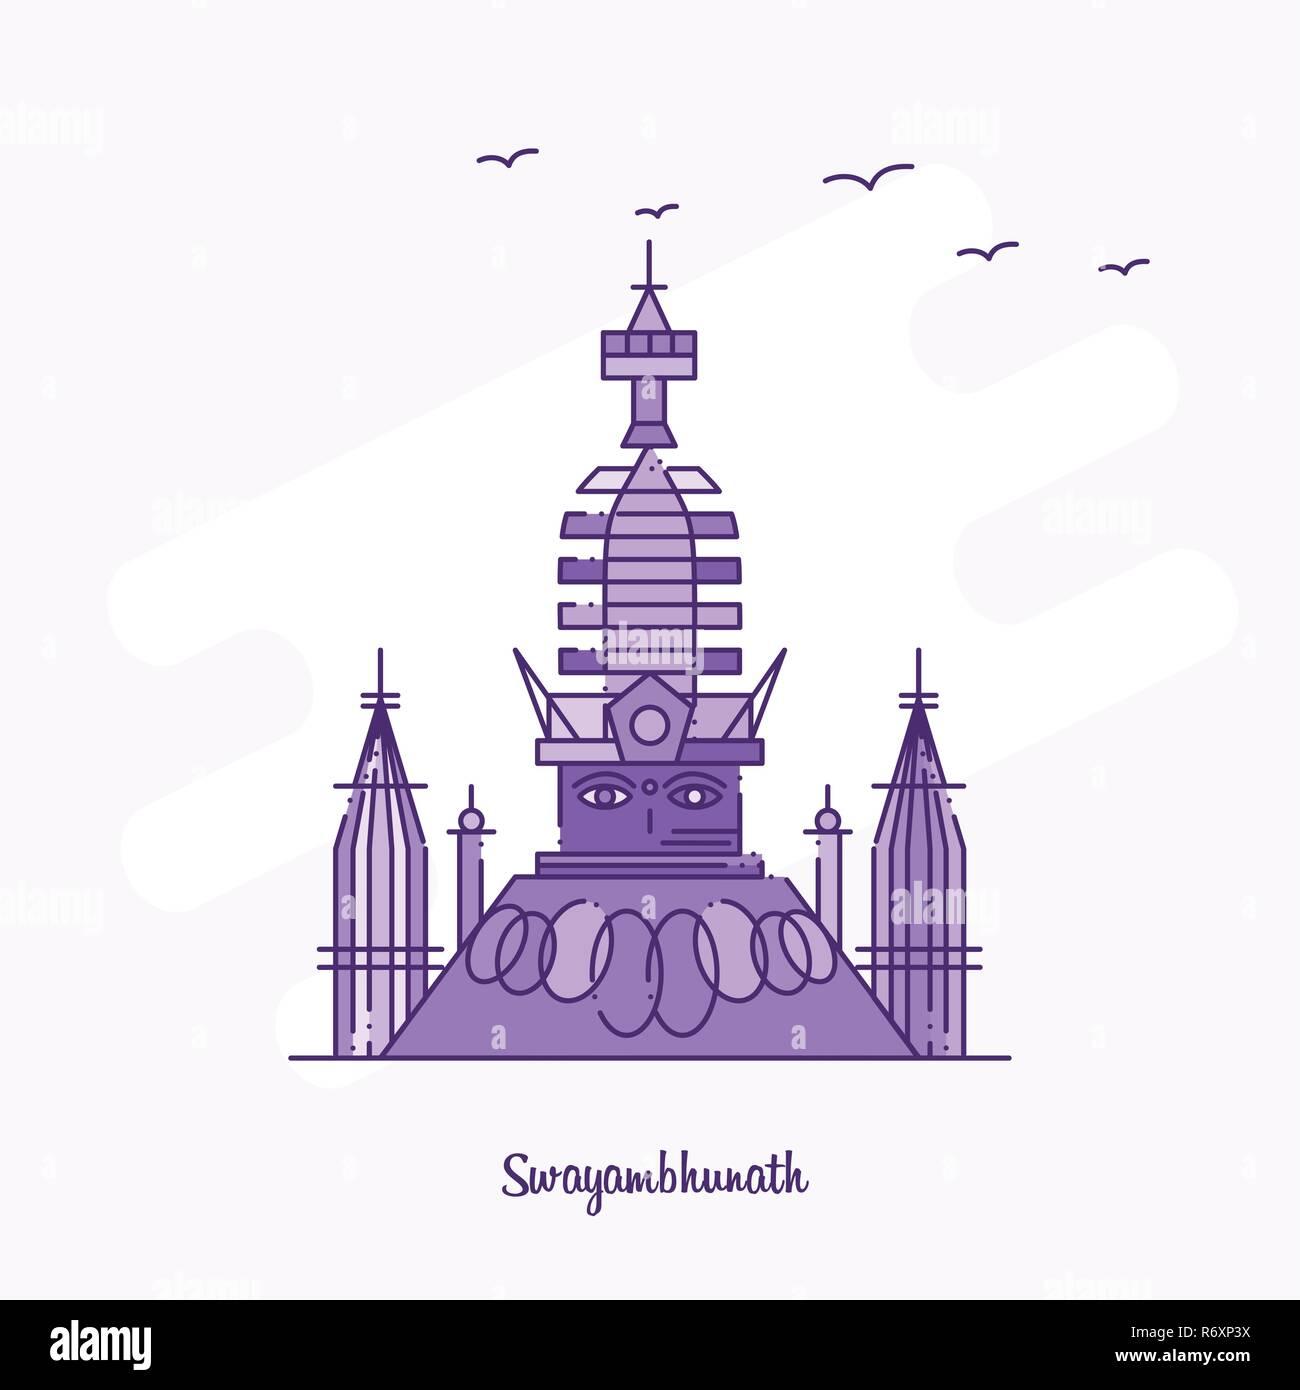 SWAYAMBHUNATH Landmark Purple Dotted Line skyline vector illustration - Stock Image